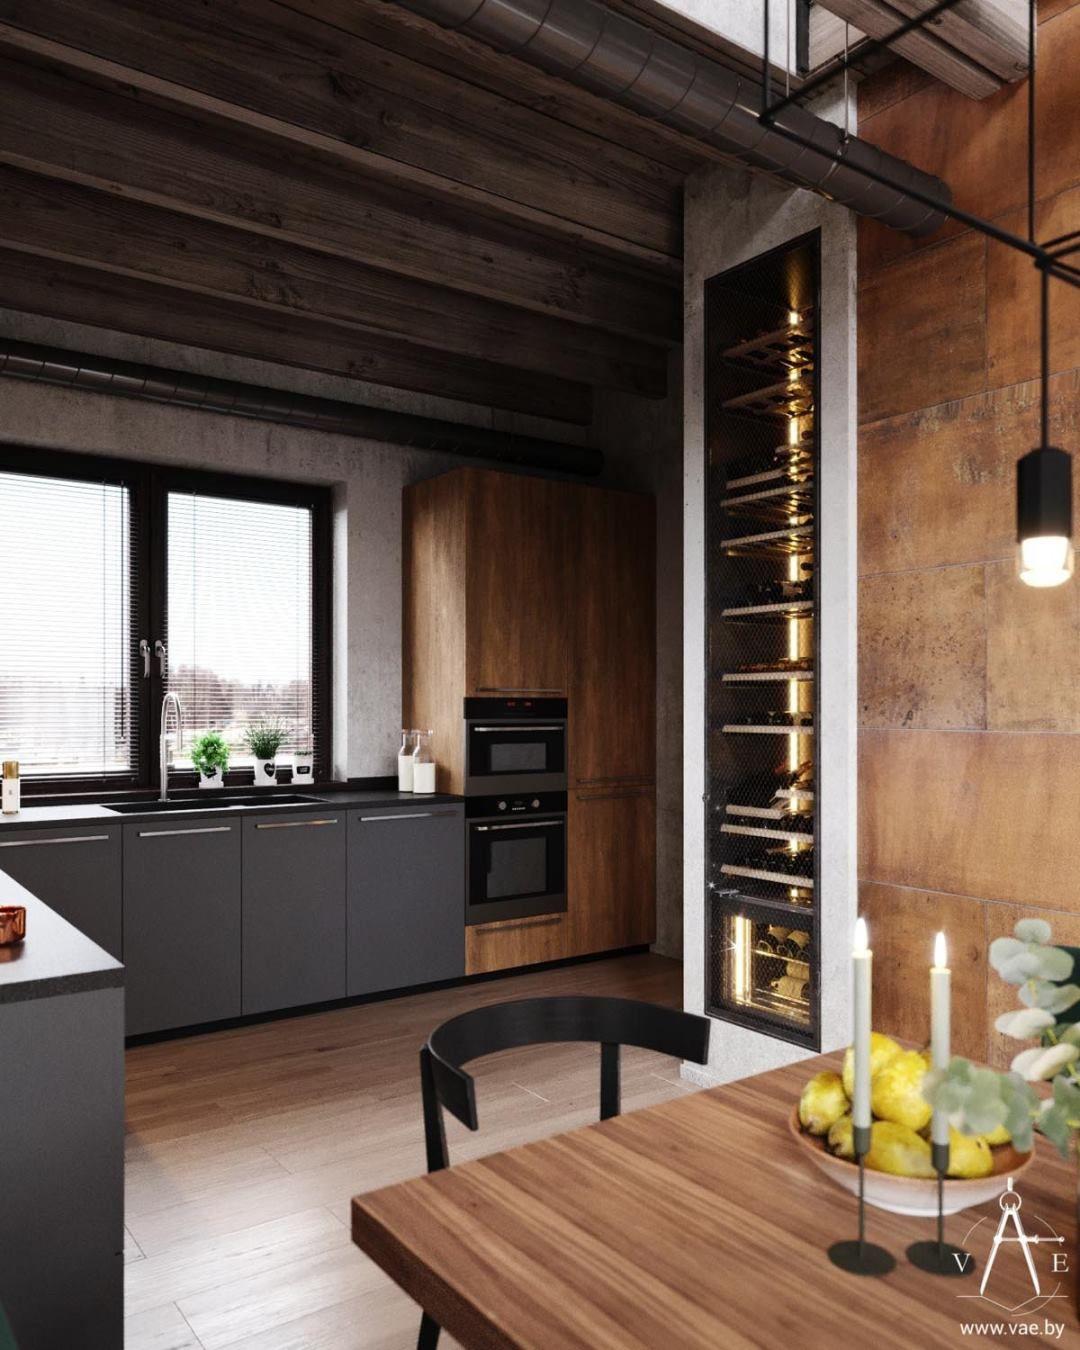 Industrial Home Decor20 Adorable Industrial Decor Kitchen Ideas